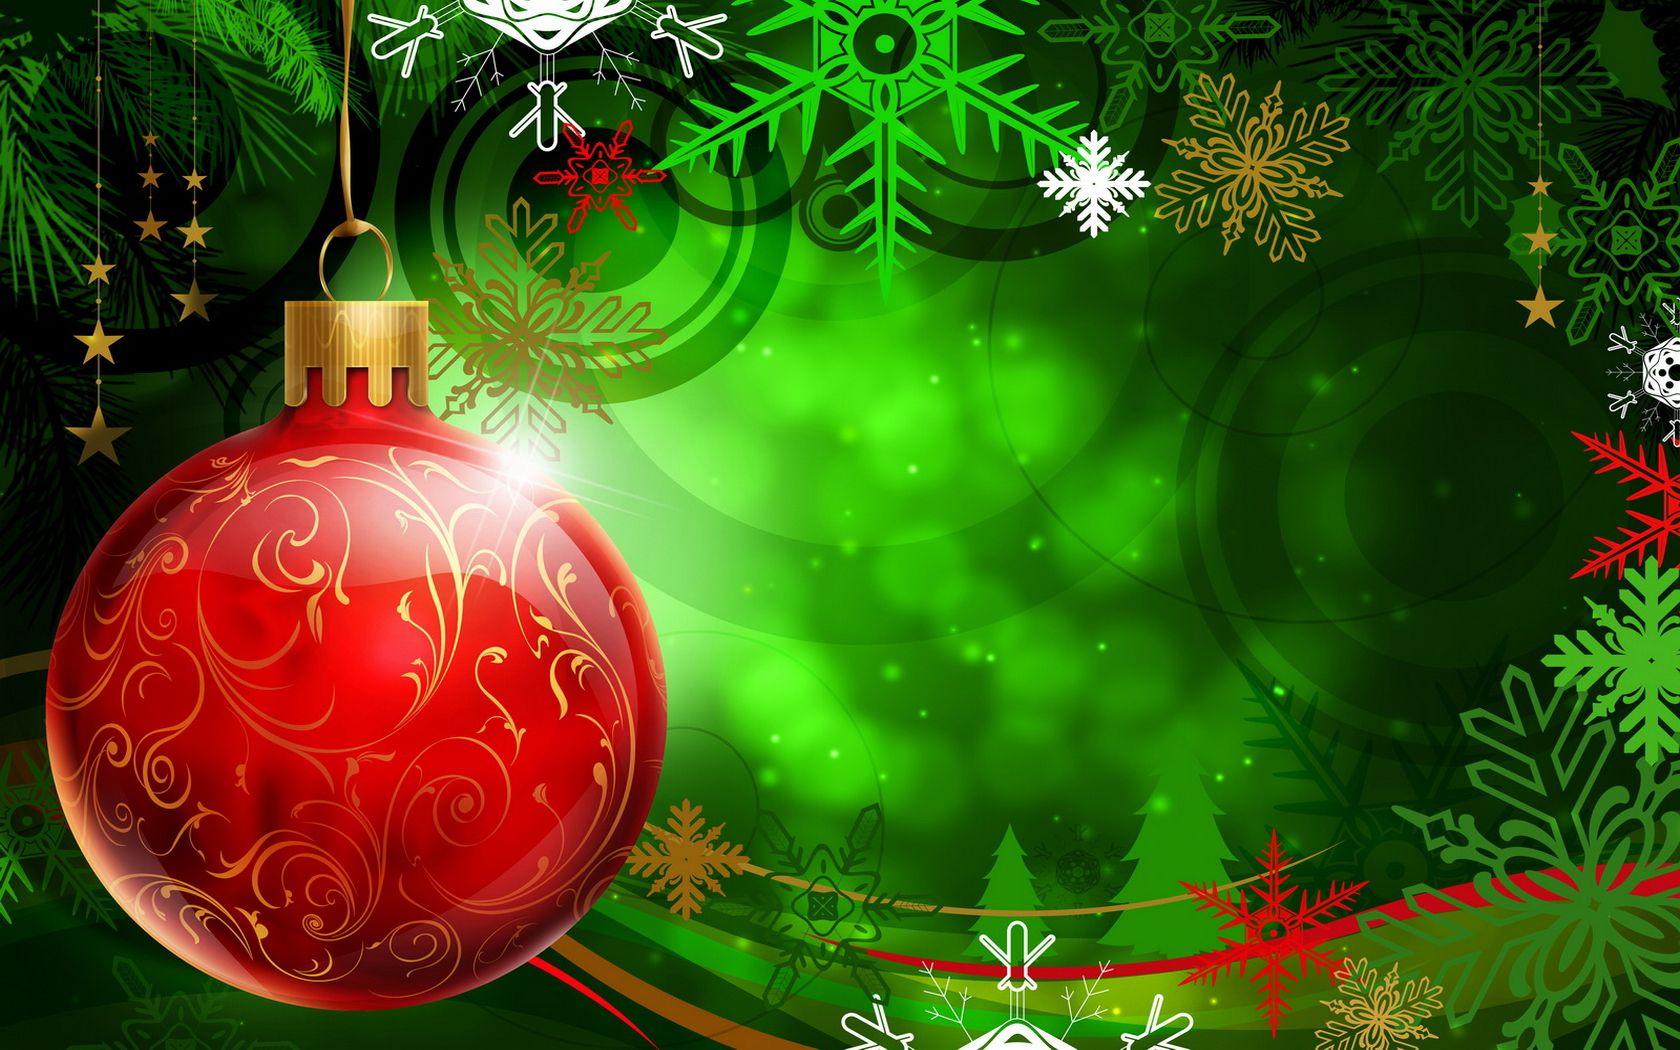 Hd Background Wallpaper Christmas For Desktop Wallpaper Christmas Wallpaper Hd Christmas Wallpaper Free Christmas Wallpaper Backgrounds